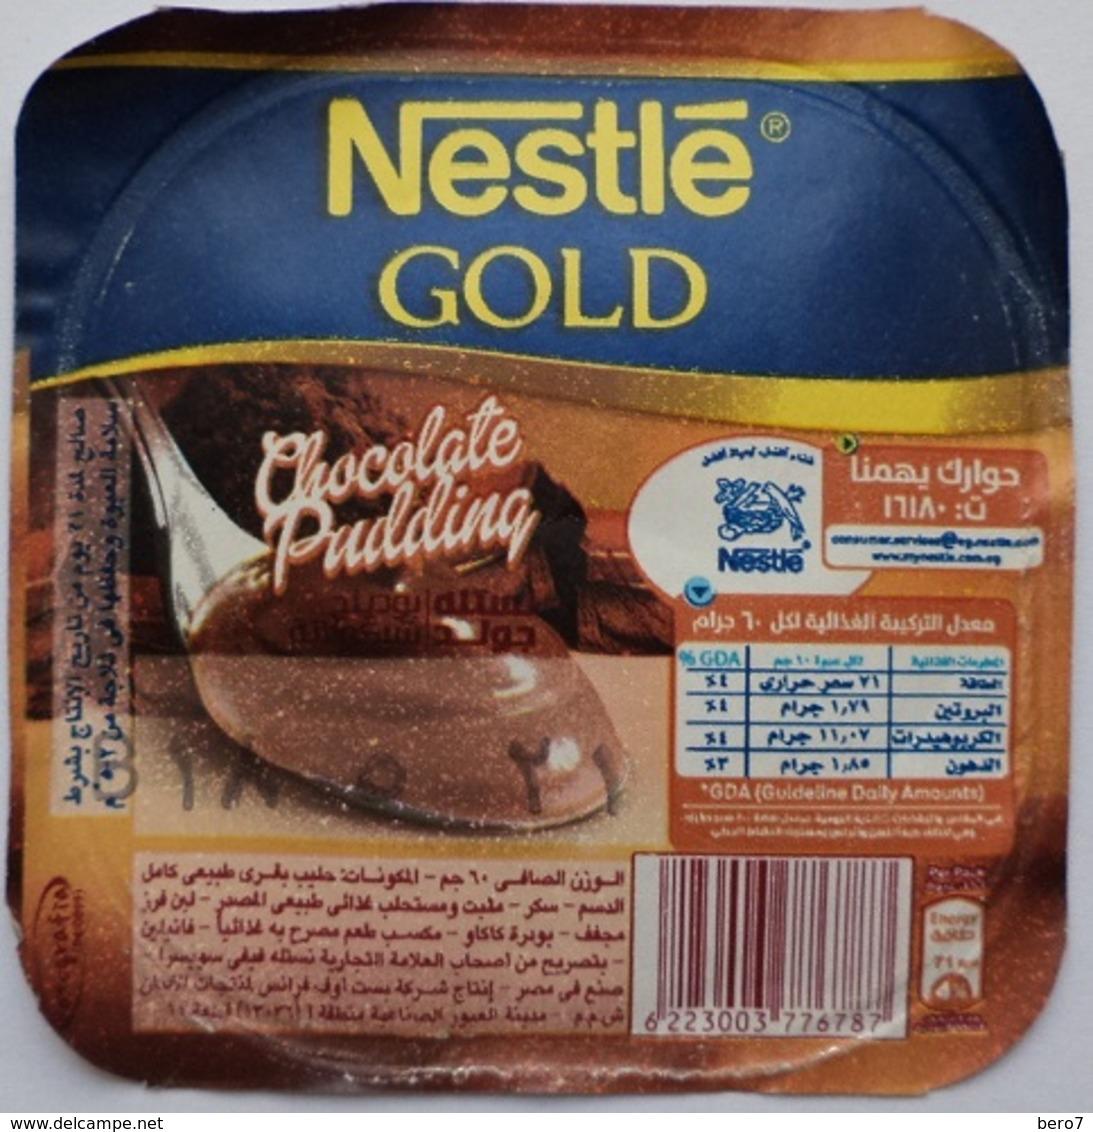 Egypt - Couvercle De Yoghurt Nestle Gold Foil) (Egypte) (Egitto) (Ägypten) (Egipto) (Egypten) Africa - Opercules De Lait